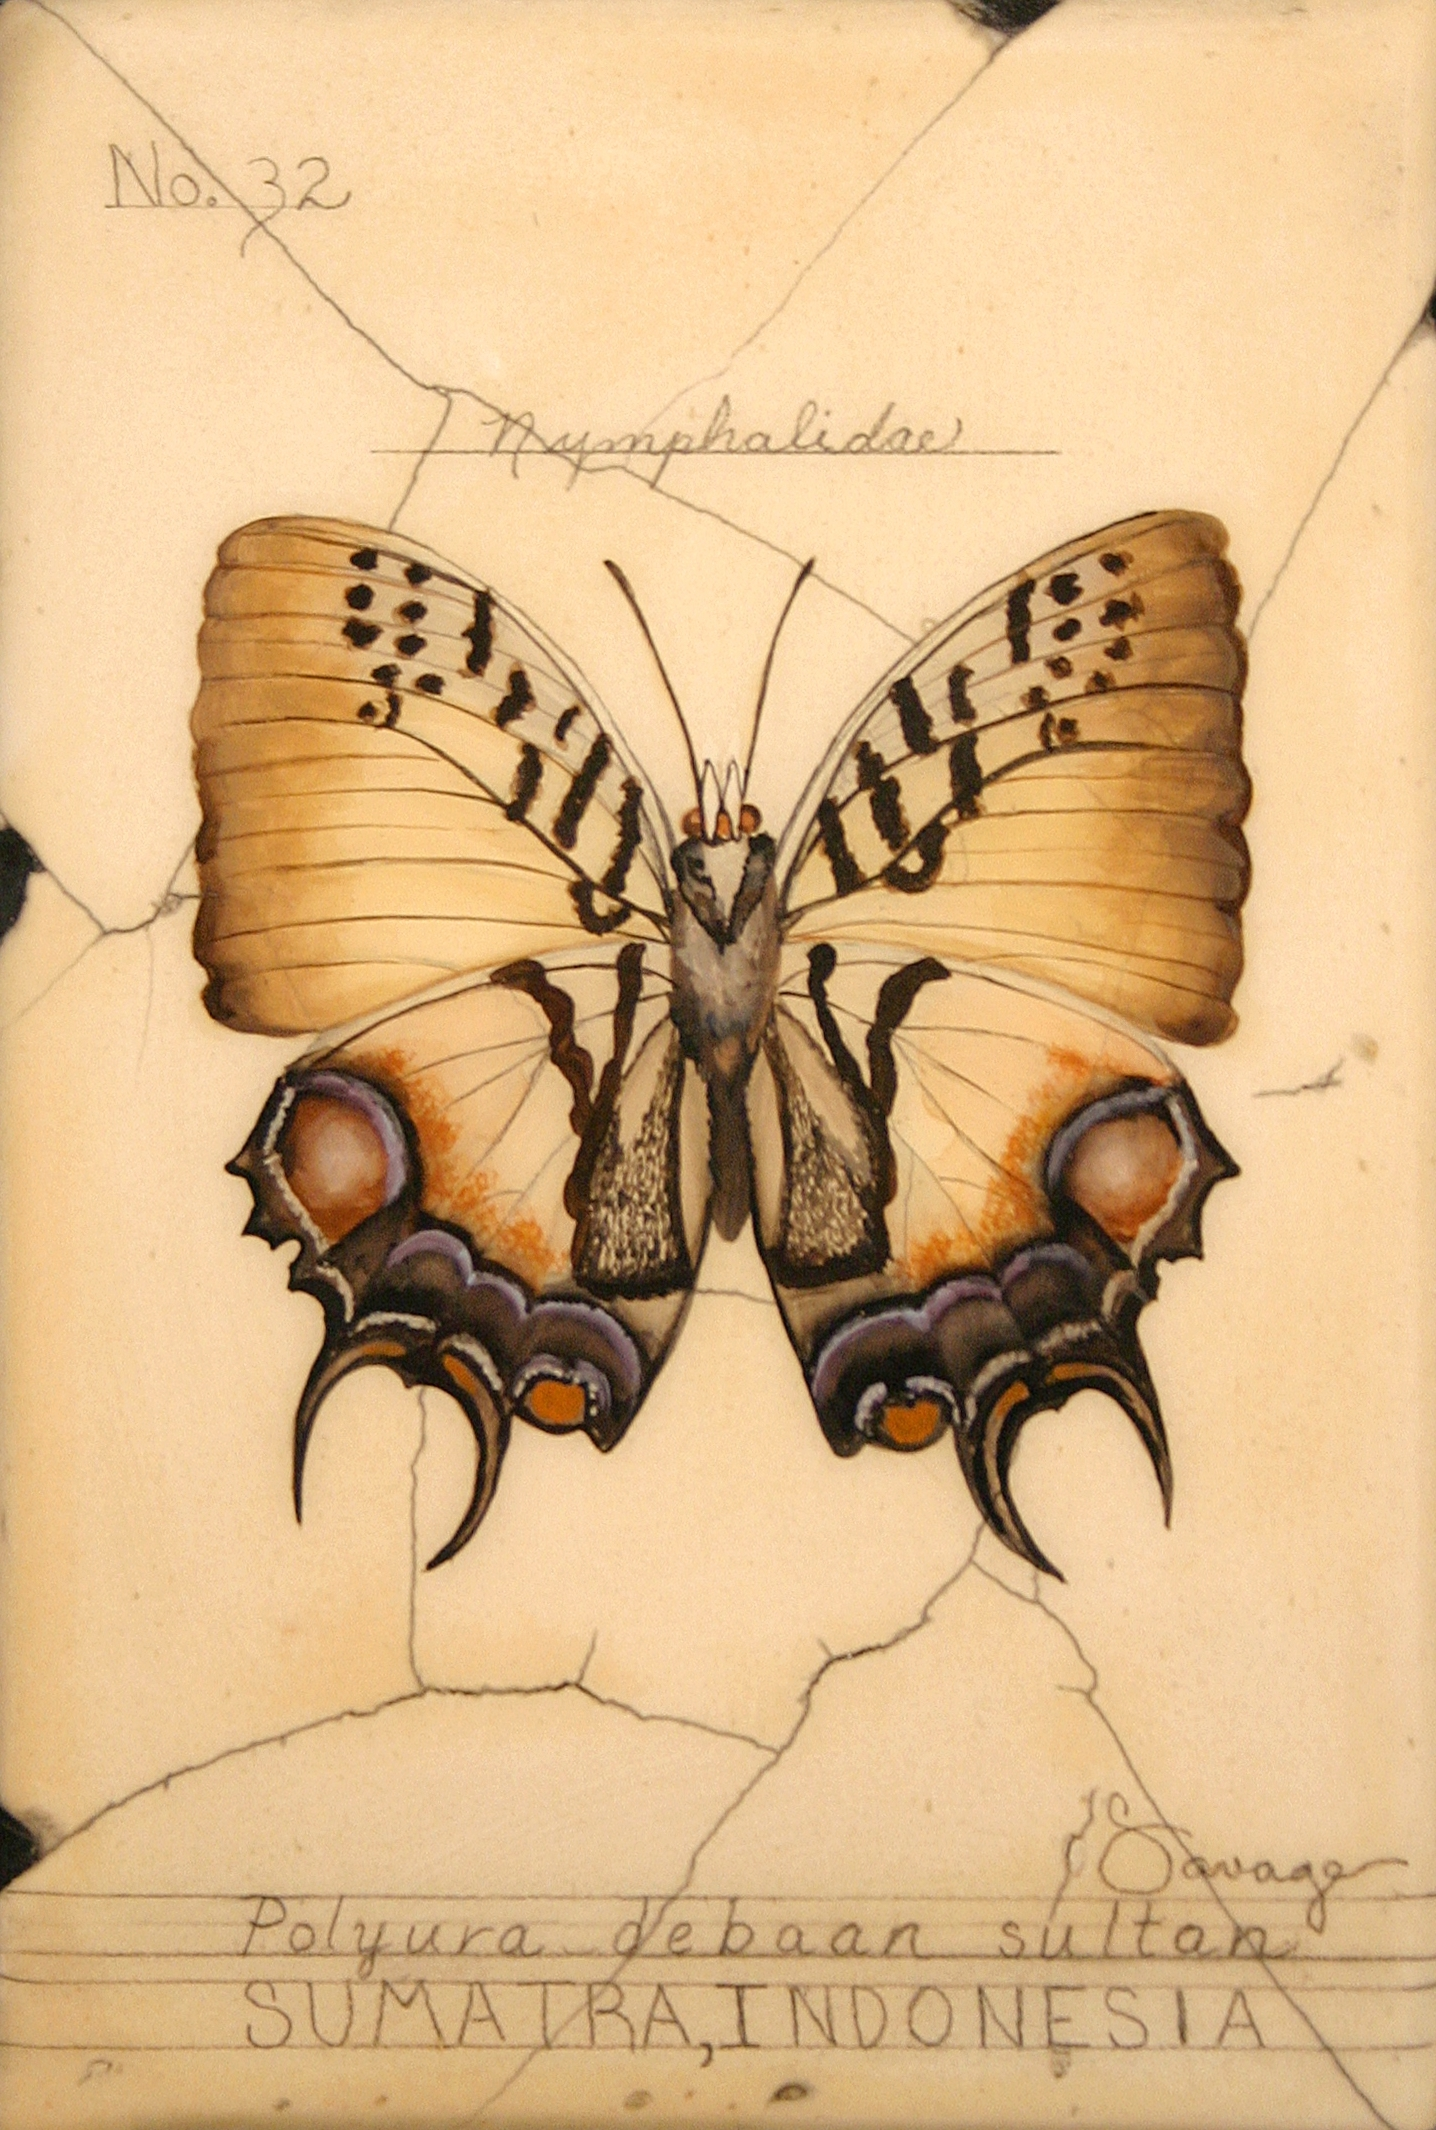 No. 32 Sumatra (Sultan) Butterfly